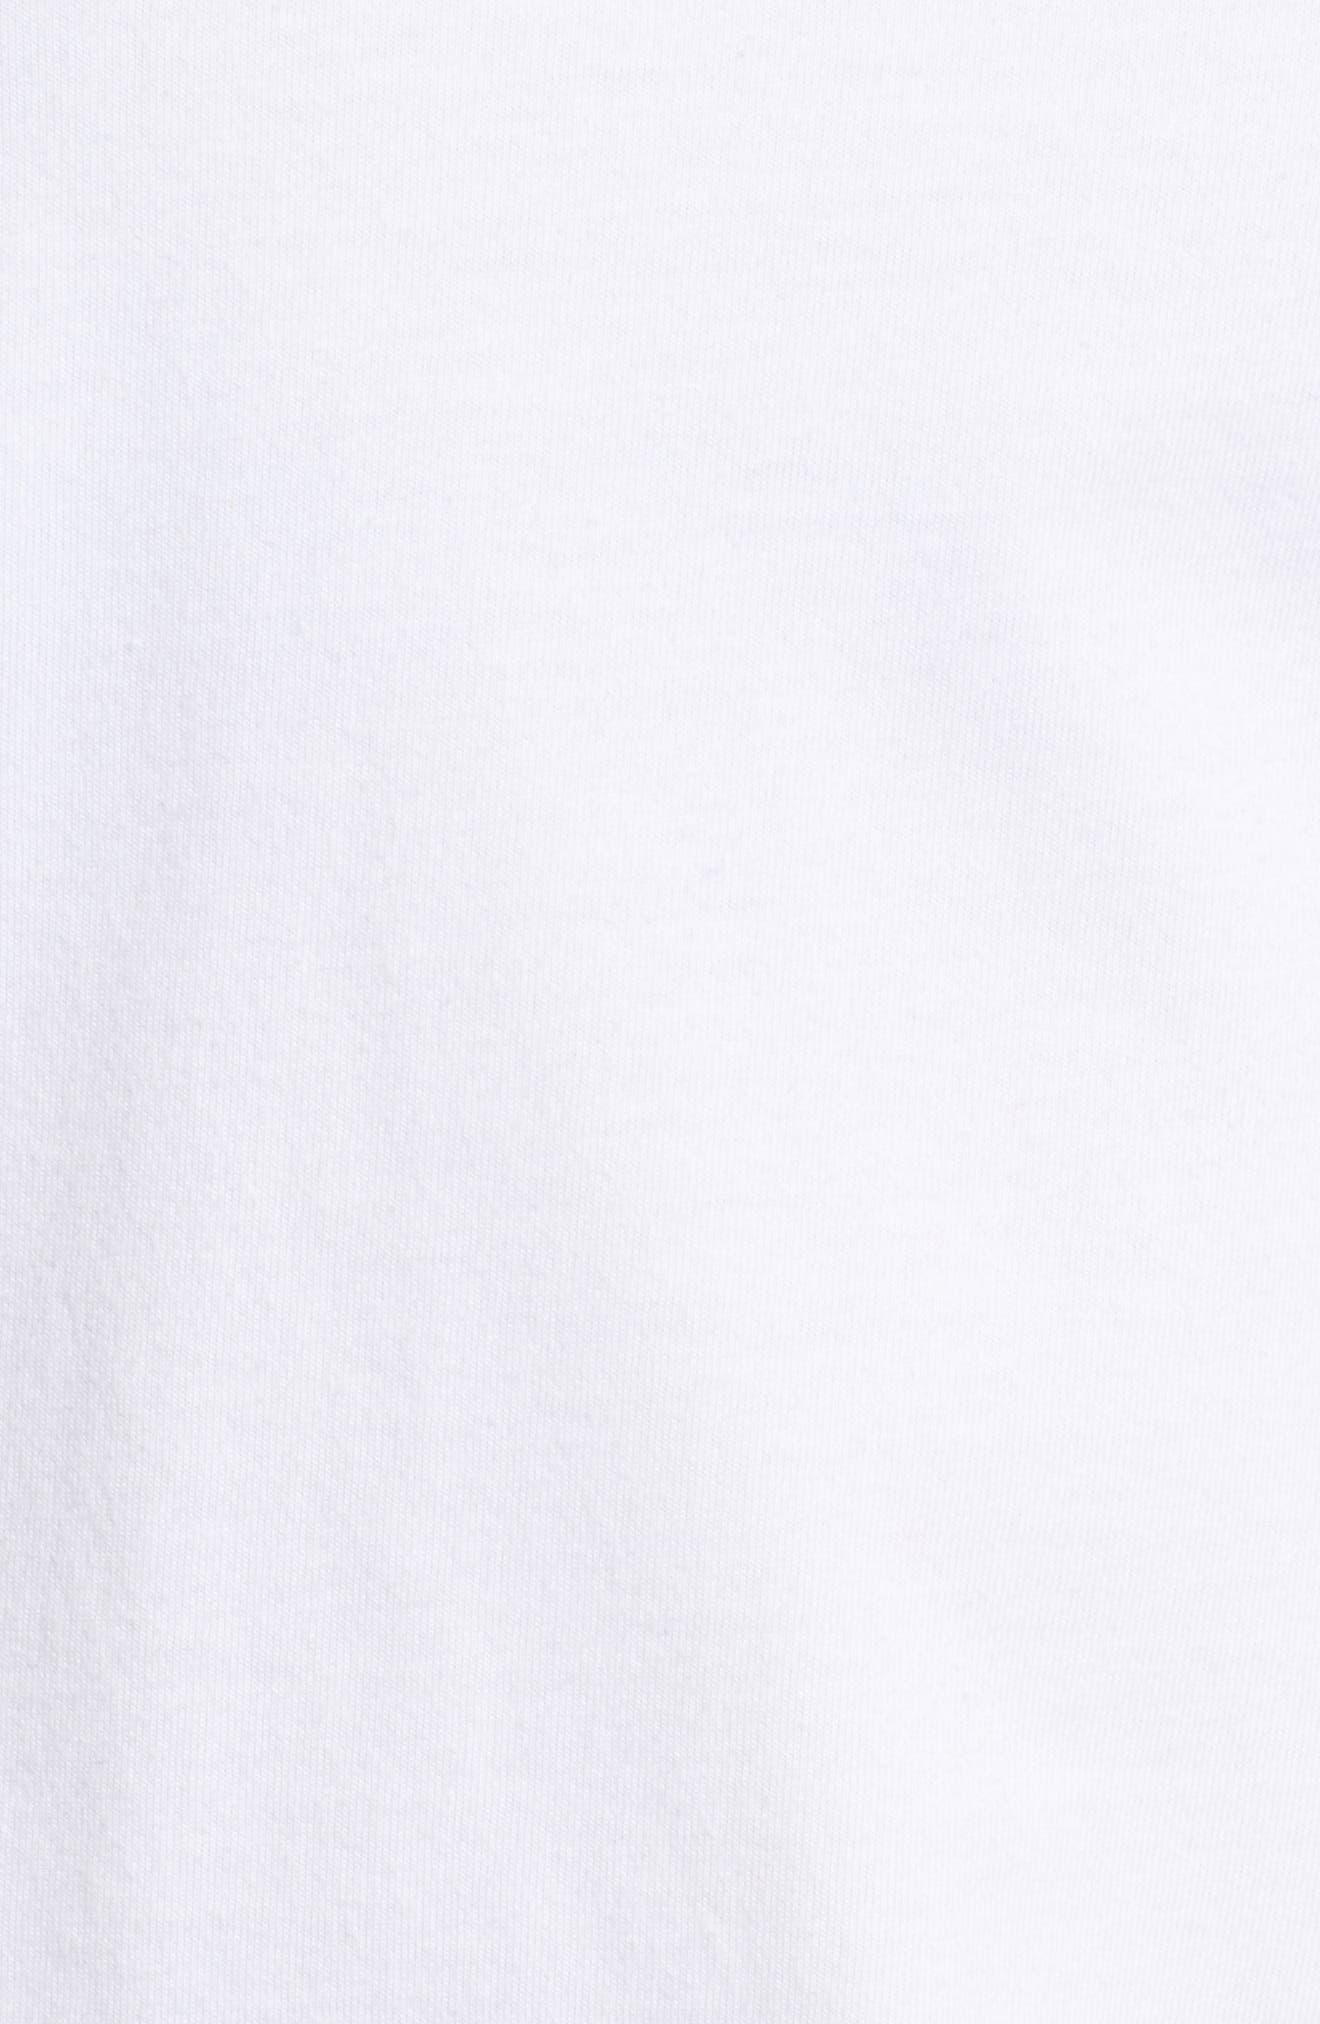 Bride of Frank Whale Pocket Tee,                             Alternate thumbnail 5, color,                             White Cap